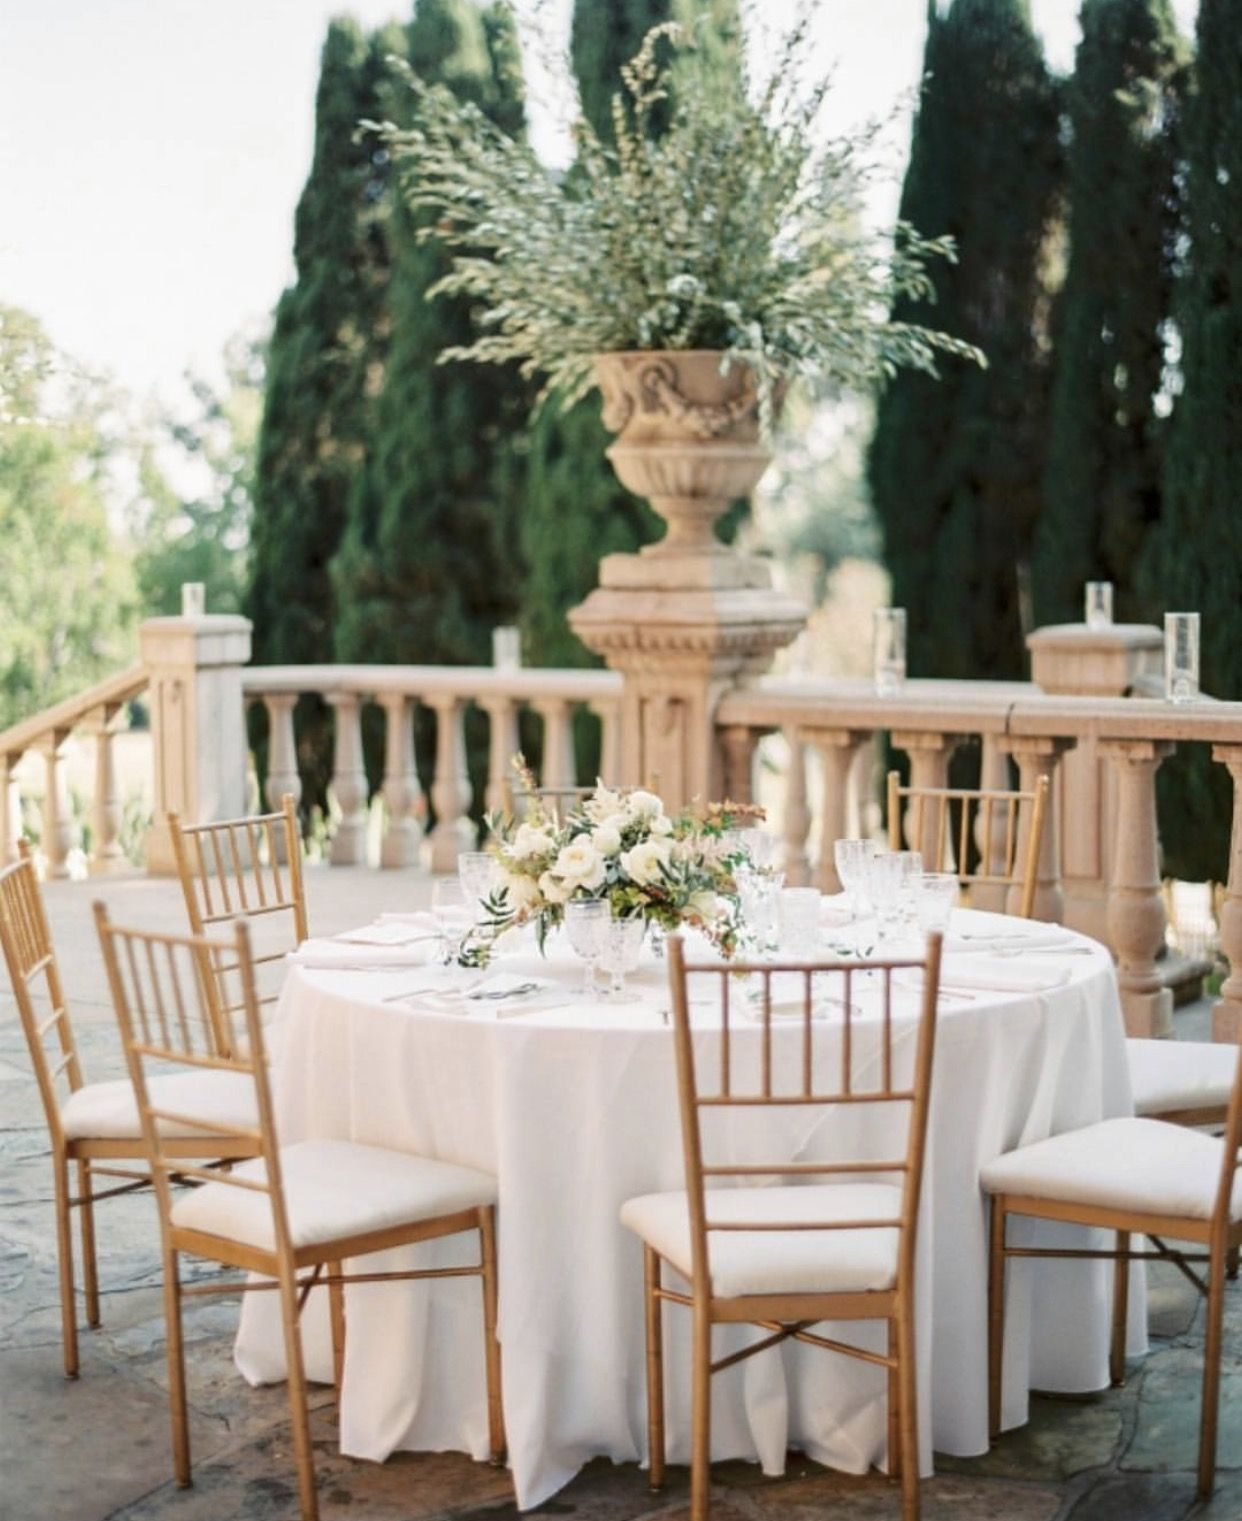 Pin By Edita Habibovic On Wedding Inspo Pinterest Wedding